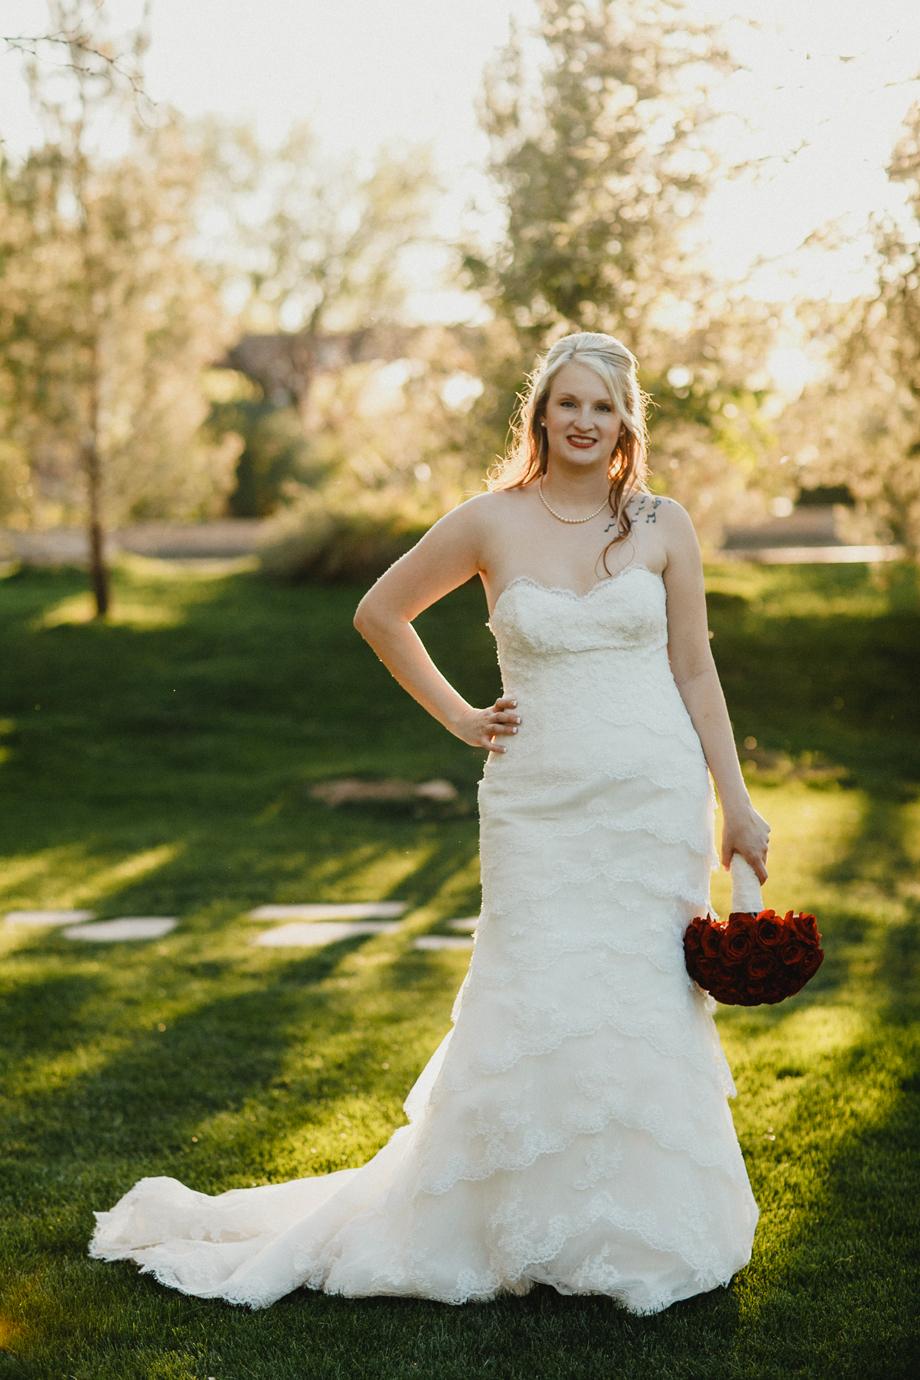 Jay & Jess, Weddings, Arizona-51.jpg